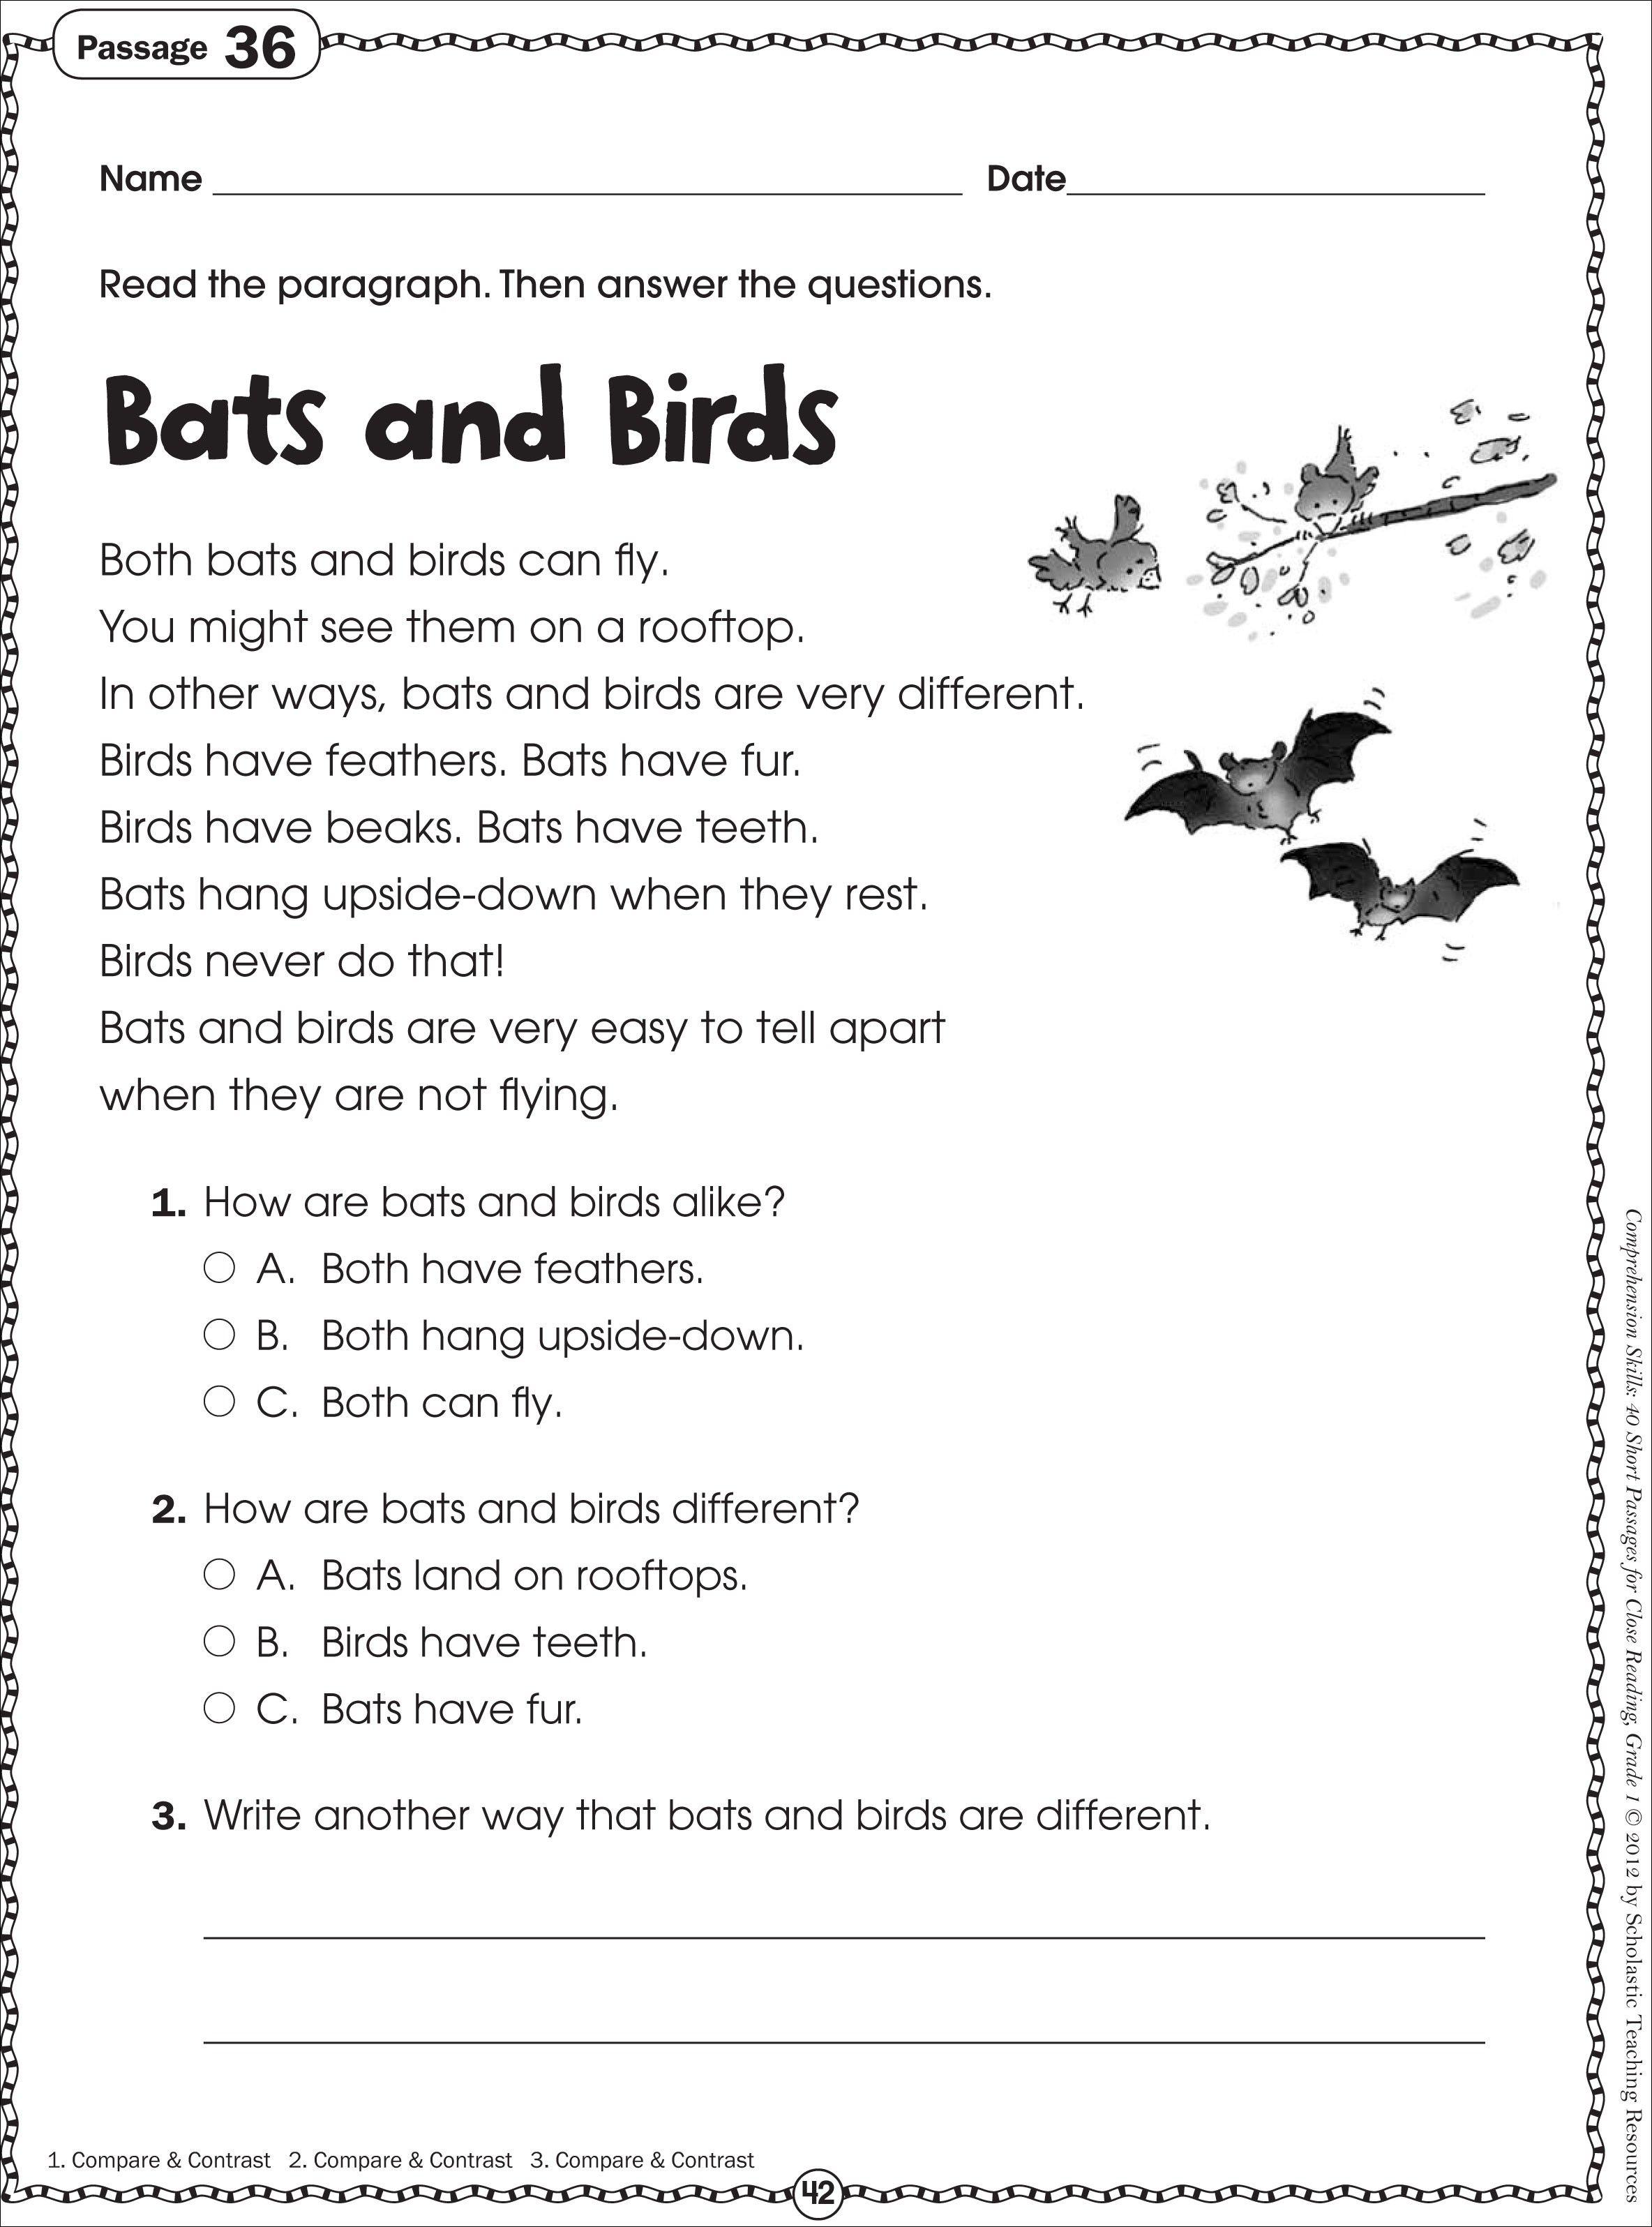 Free Printable Reading Comprehension Worksheets For Kindergarten | Printable Reading Comprehension Worksheets